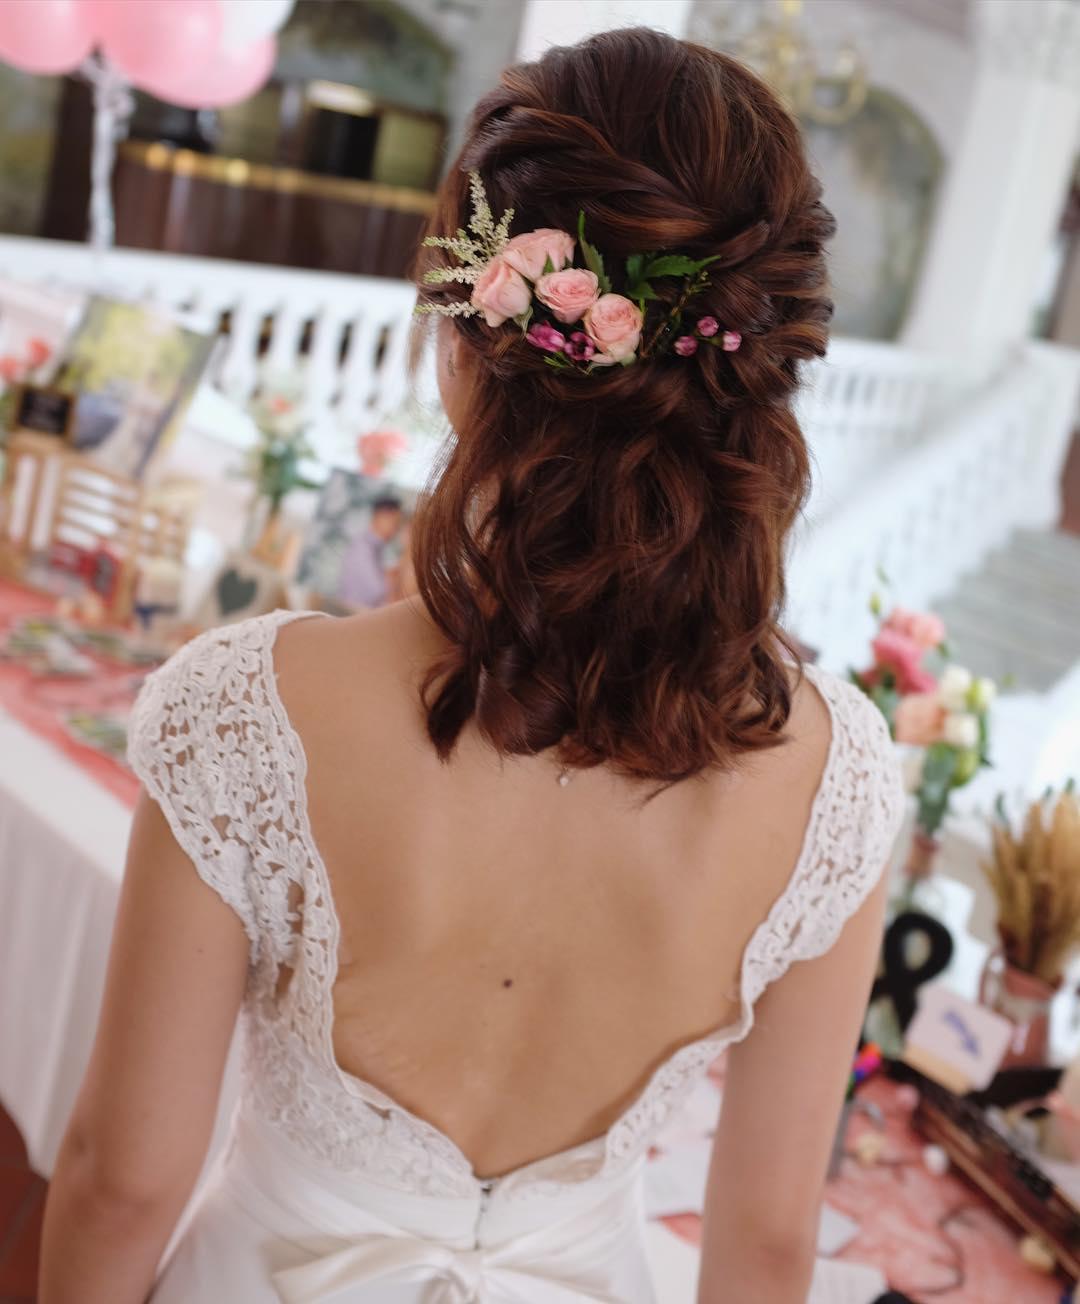 Terrific 30 Beach Wedding Hairstyles Ideas Designs Design Trends Hairstyles For Men Maxibearus